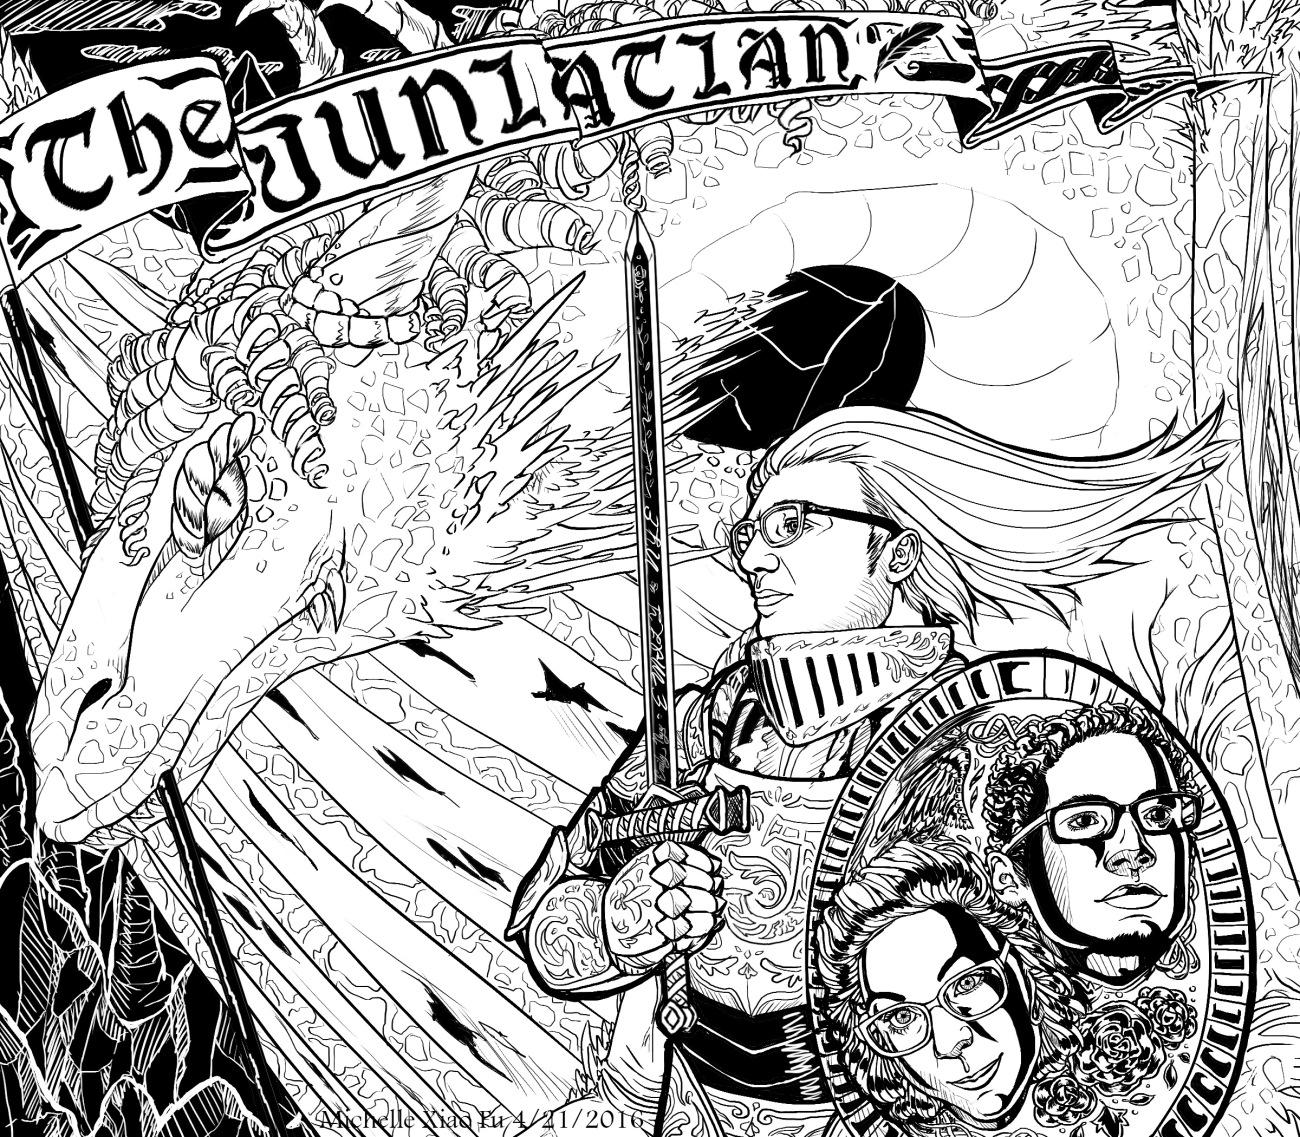 Issue 10 - Comic